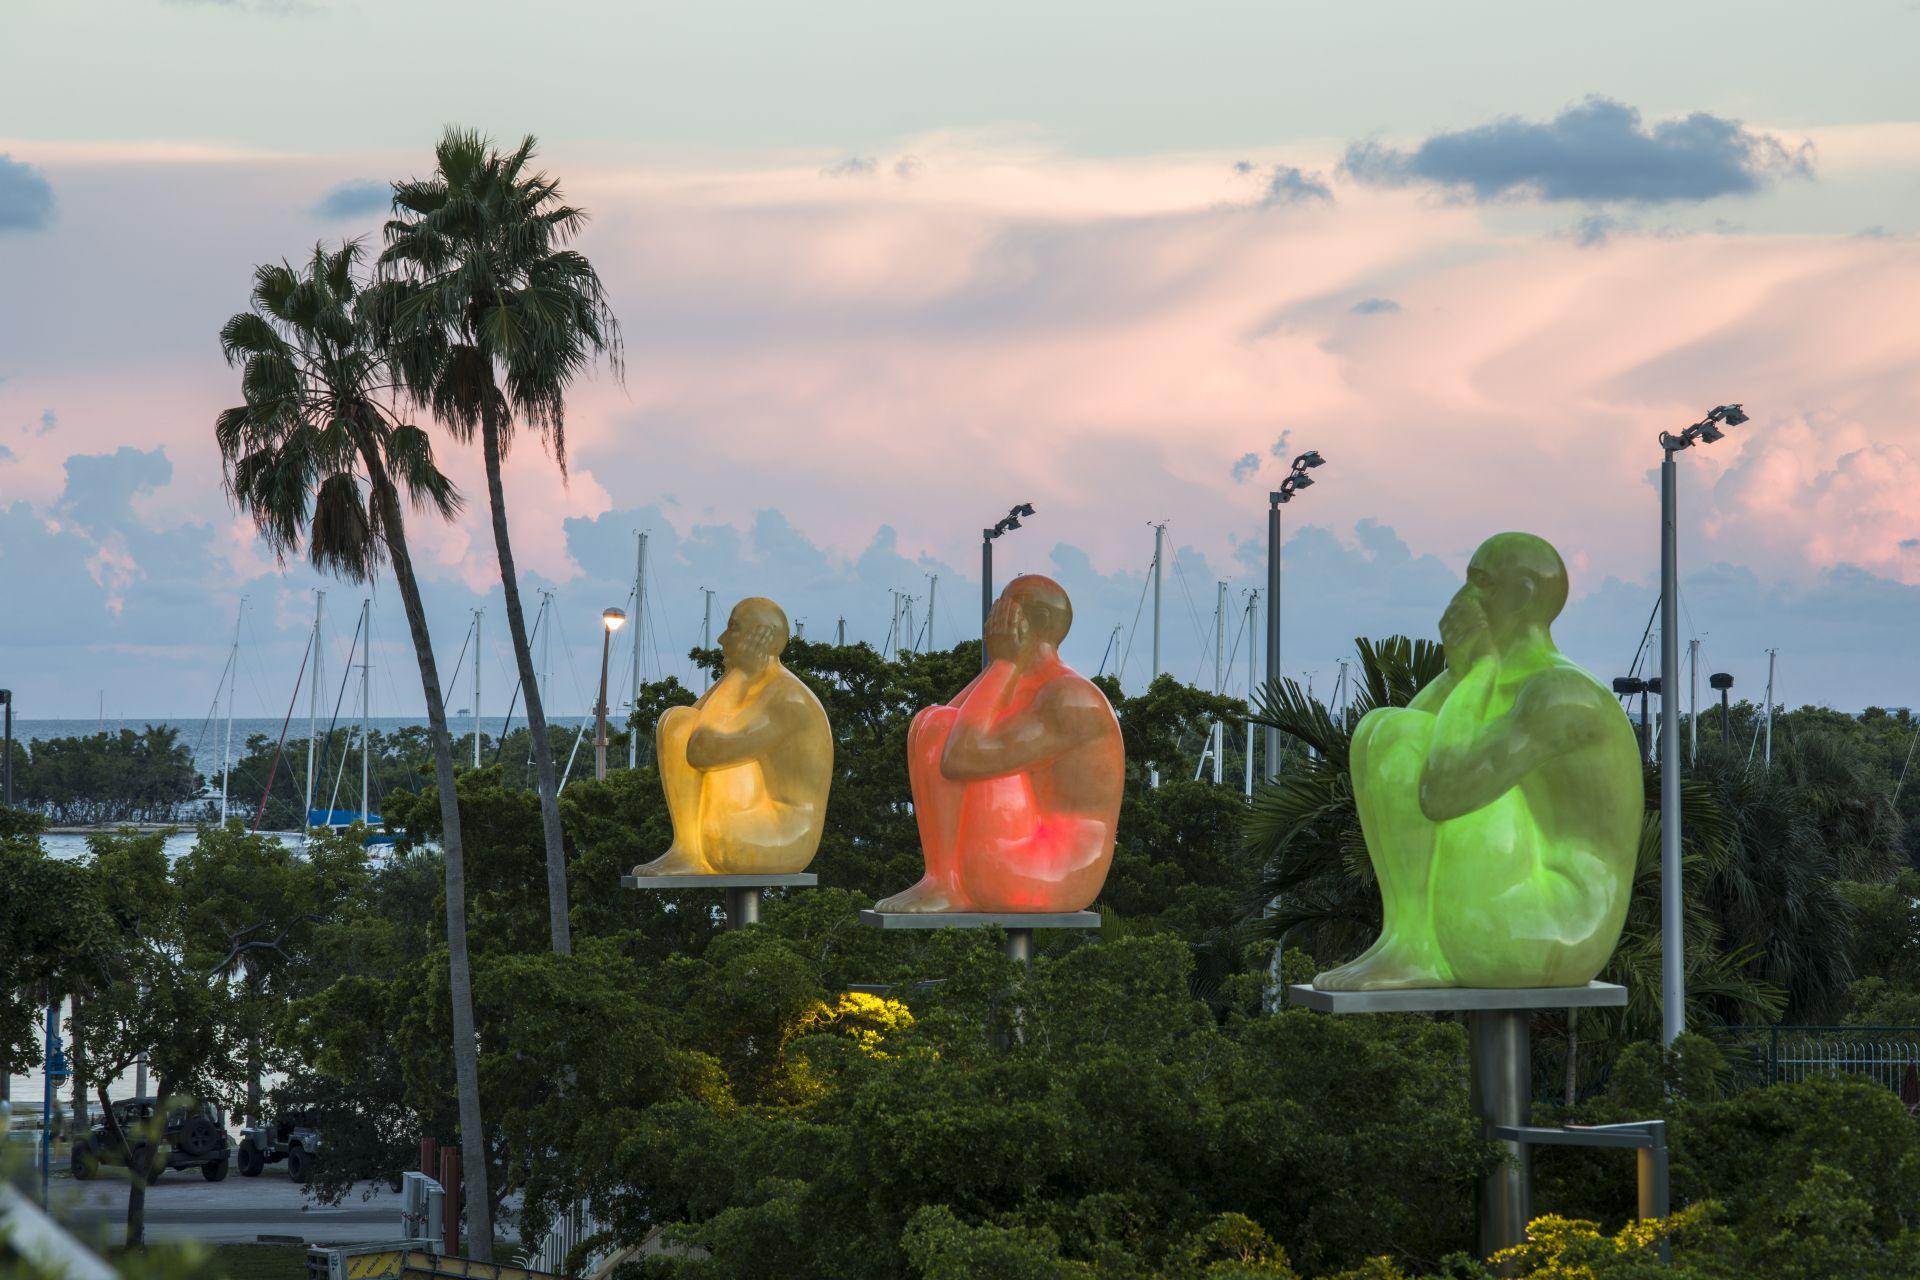 outdoor art display at sunset